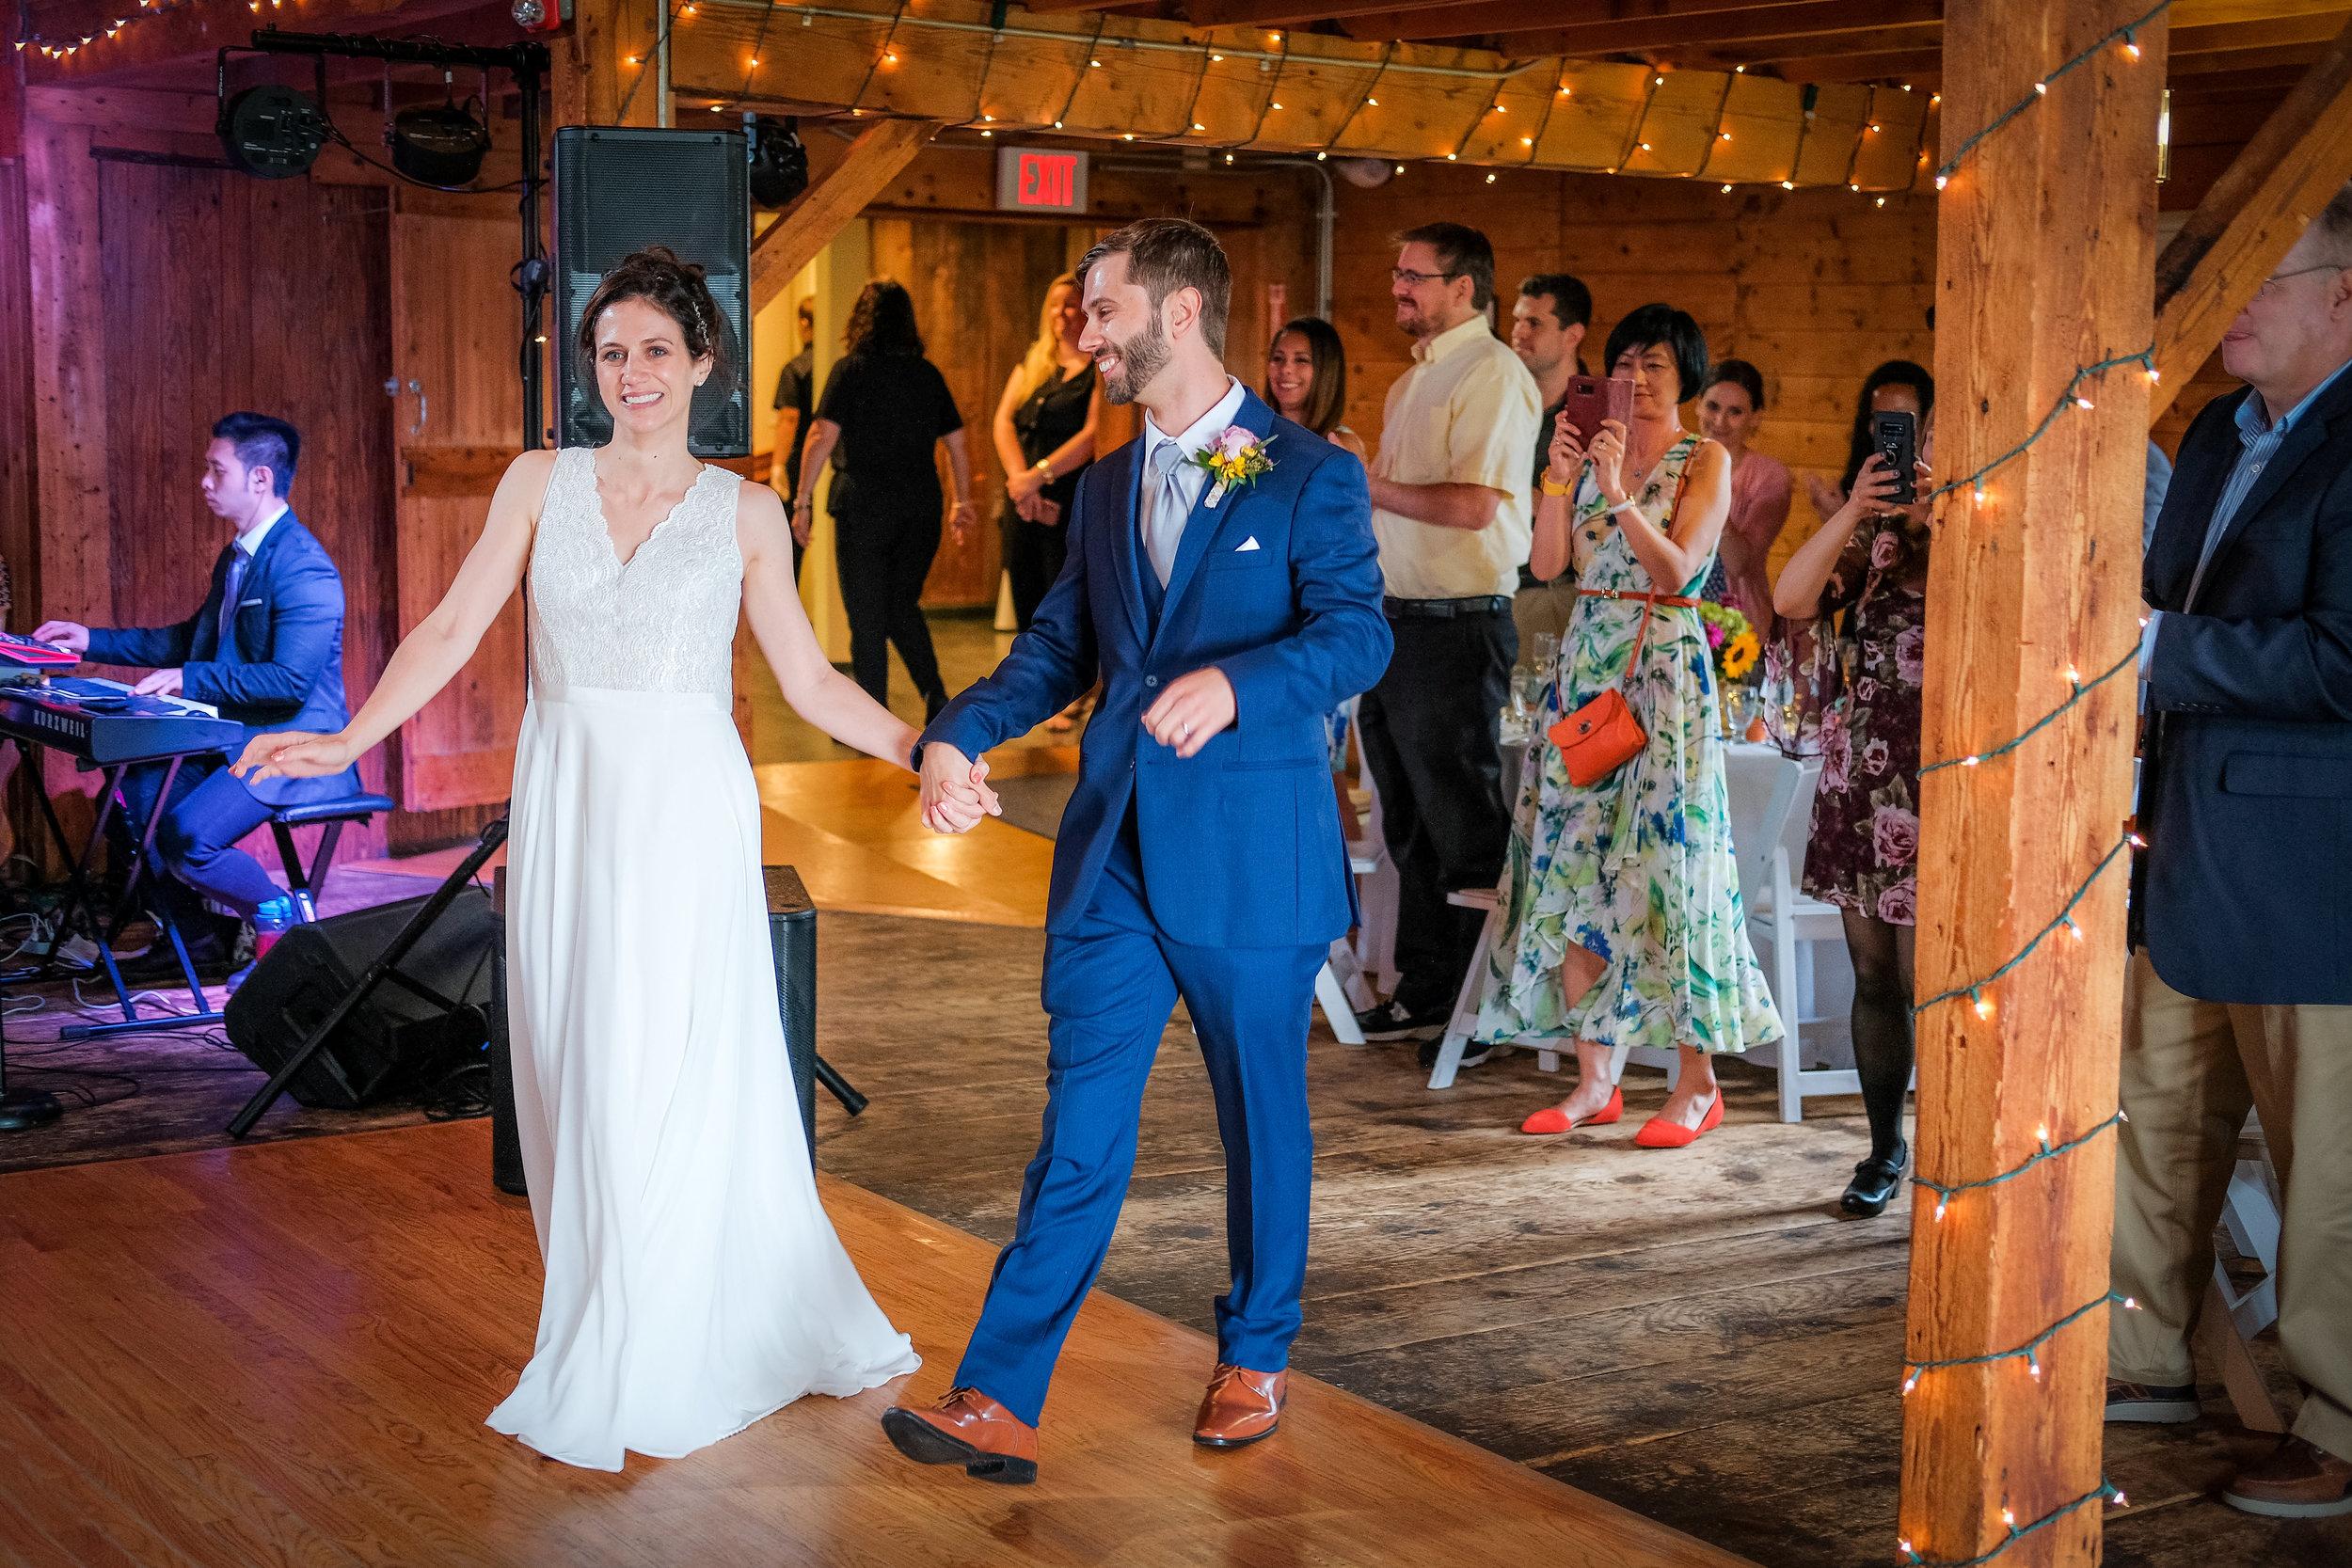 Peabody-Smith-Barn-Wedding-Photography-21.jpg